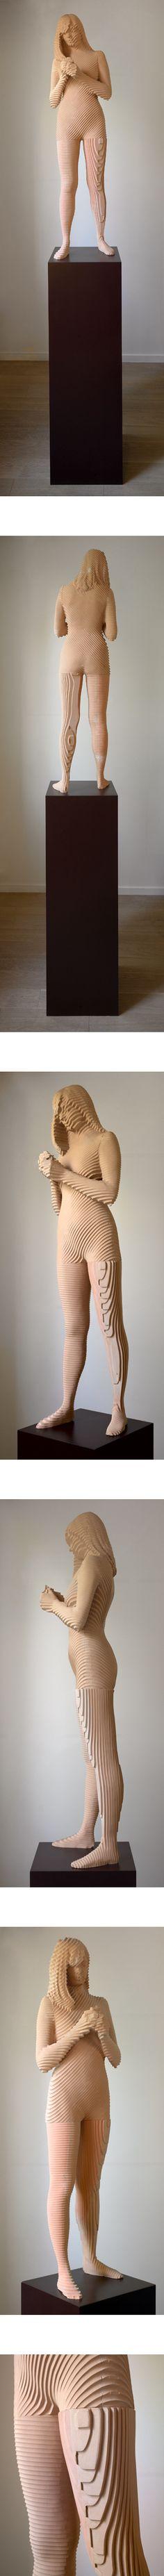 Debora by Xavier Veilhan Xavier Veilhan, Plywood Shelves, Art 3d, Wood Sculpture, Geometric Art, Art And Architecture, Installation Art, Wood Carving, Wood Art